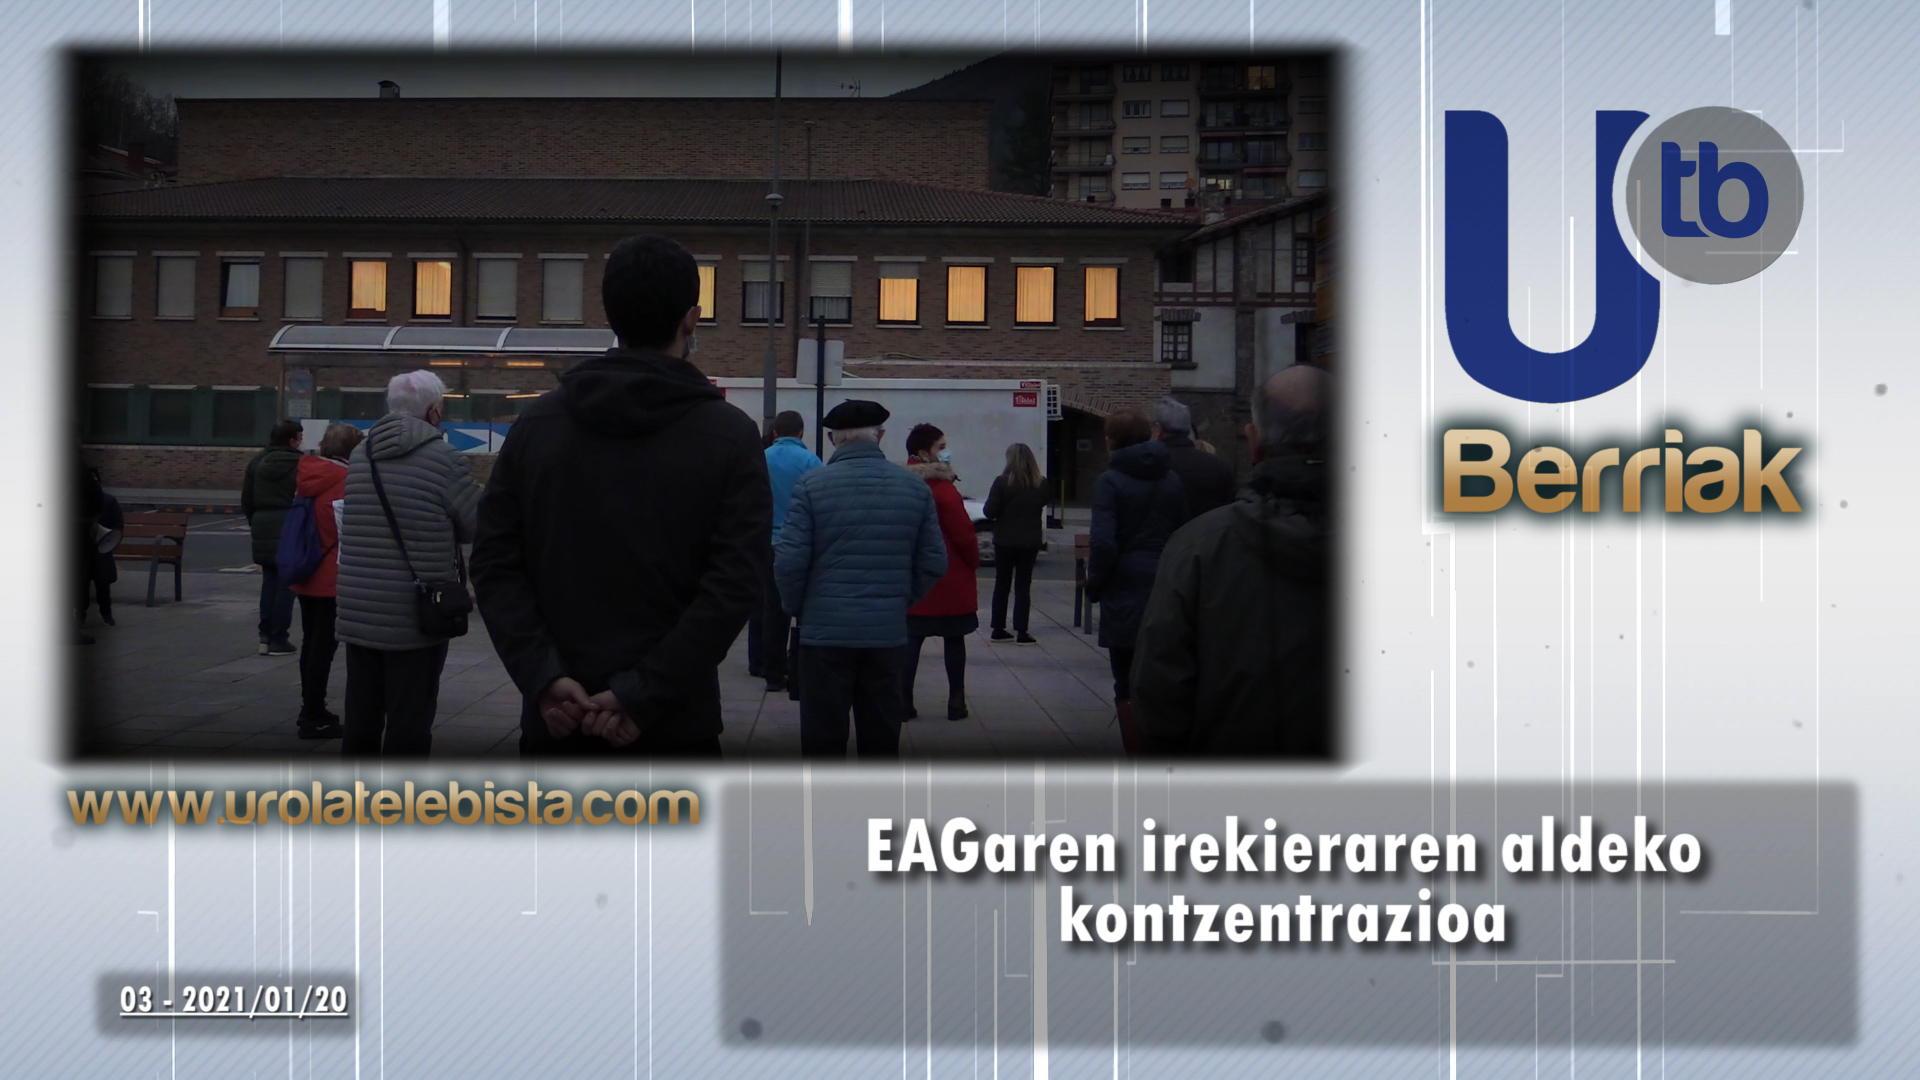 EAGaren irekieraren aldeko kontzentrazioa / Concentración para la reapertura del PAC